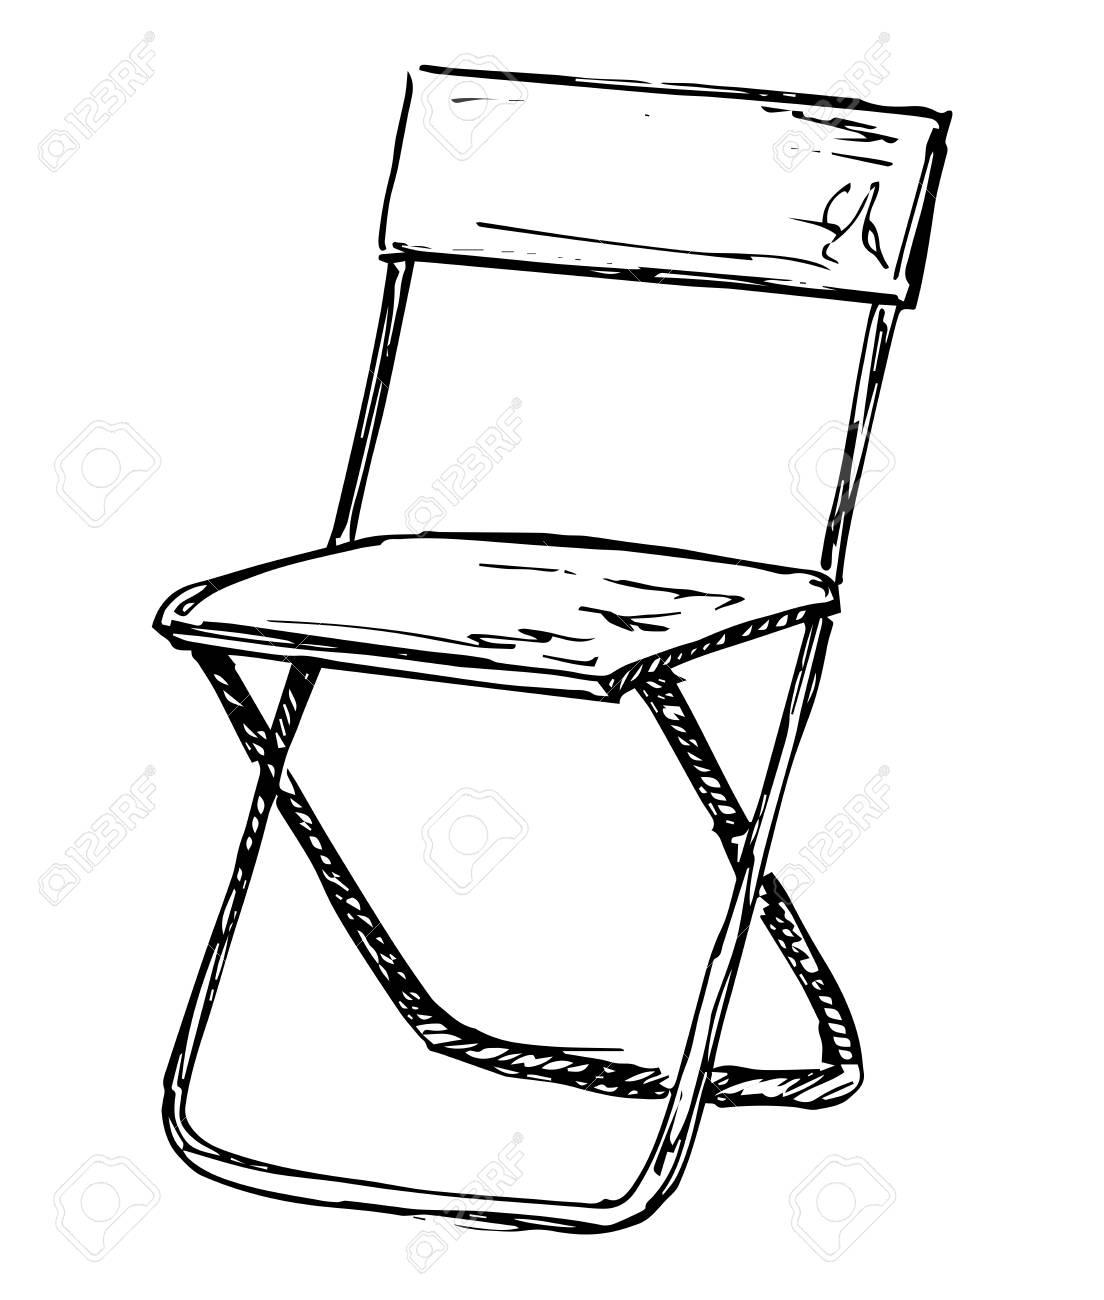 silla plegable dibujo